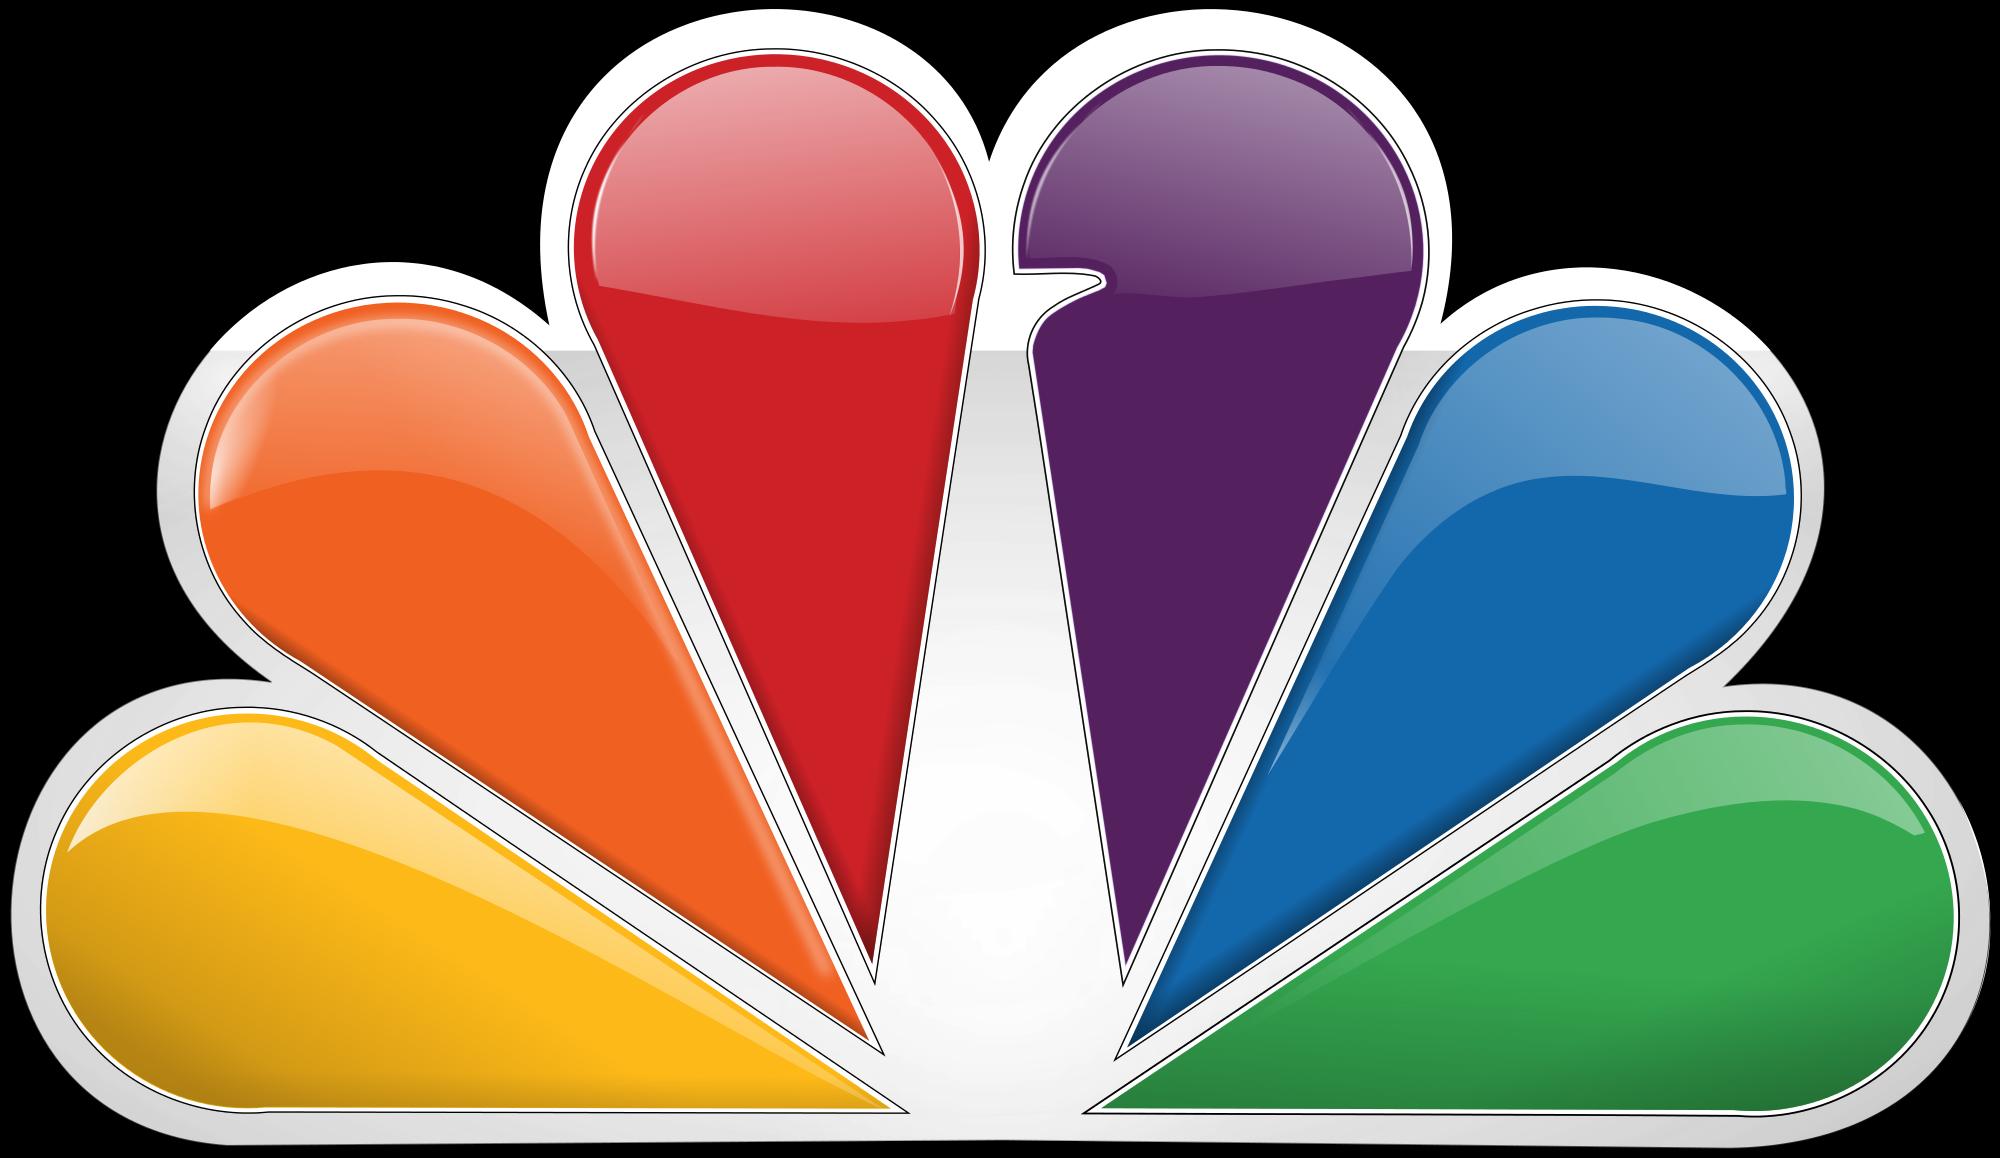 Rainbow peacock Logos.